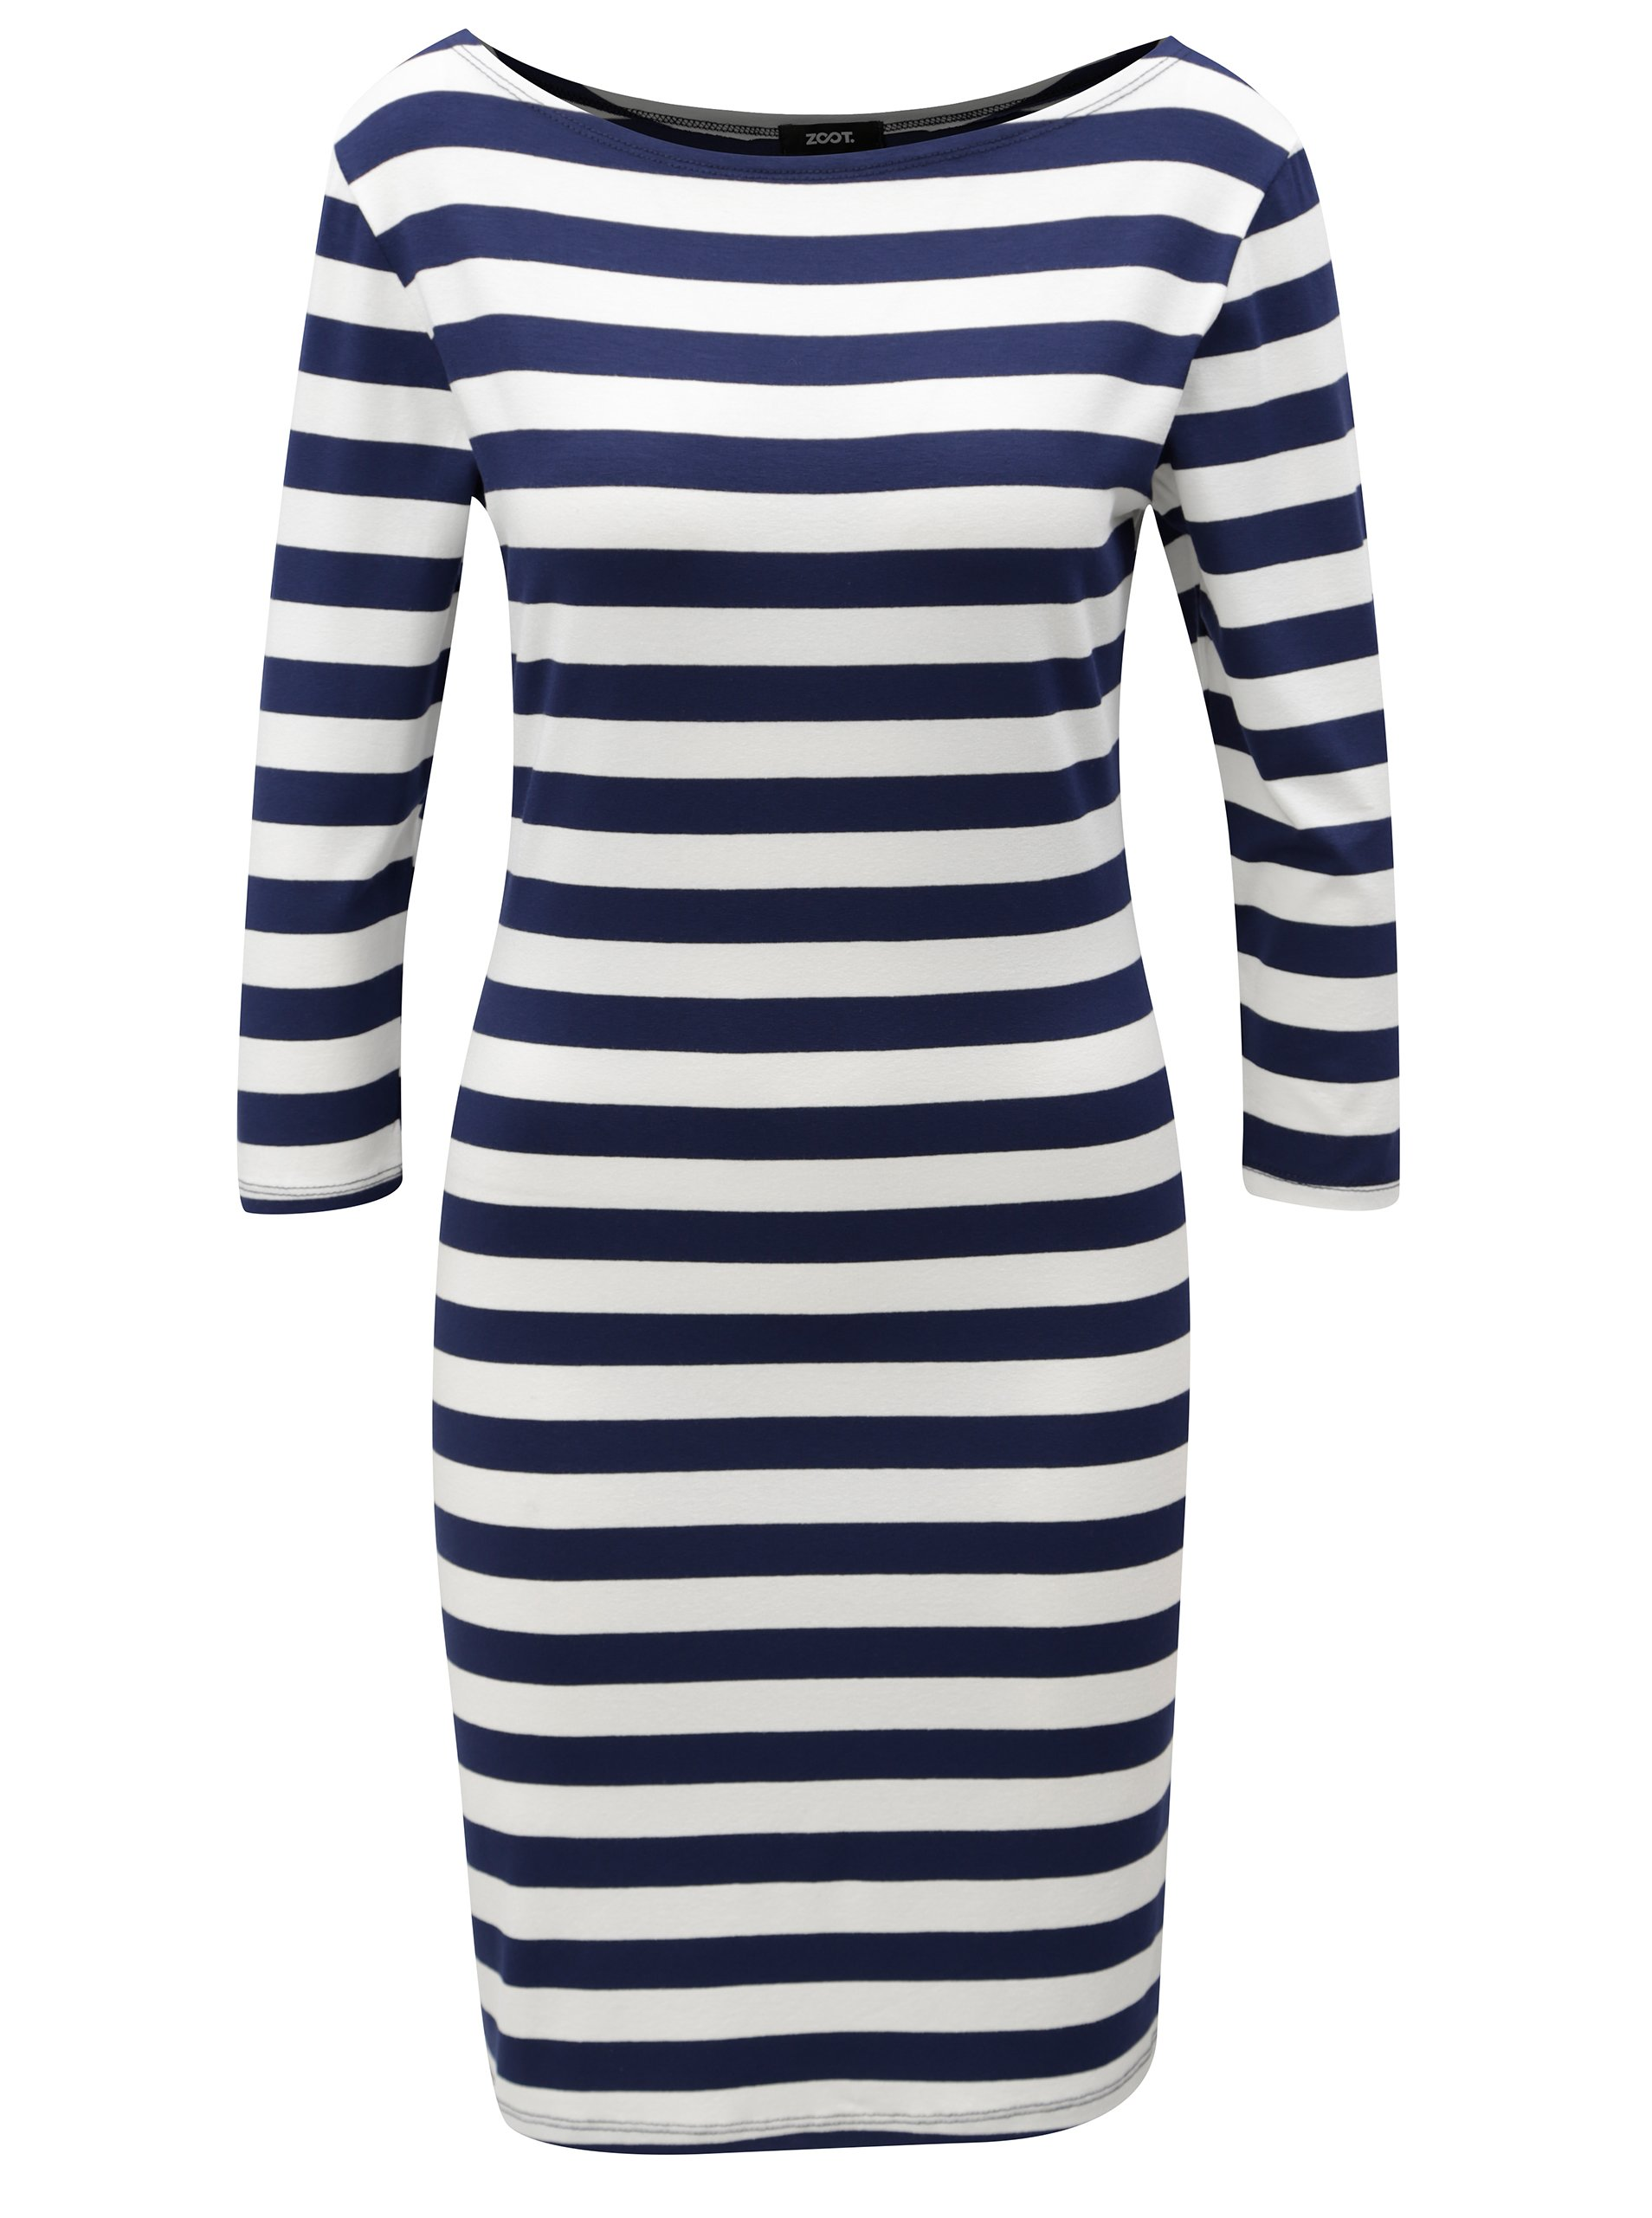 Modro-biele pruhované šaty s 3 4 rukávom ZOOT  4275874d034